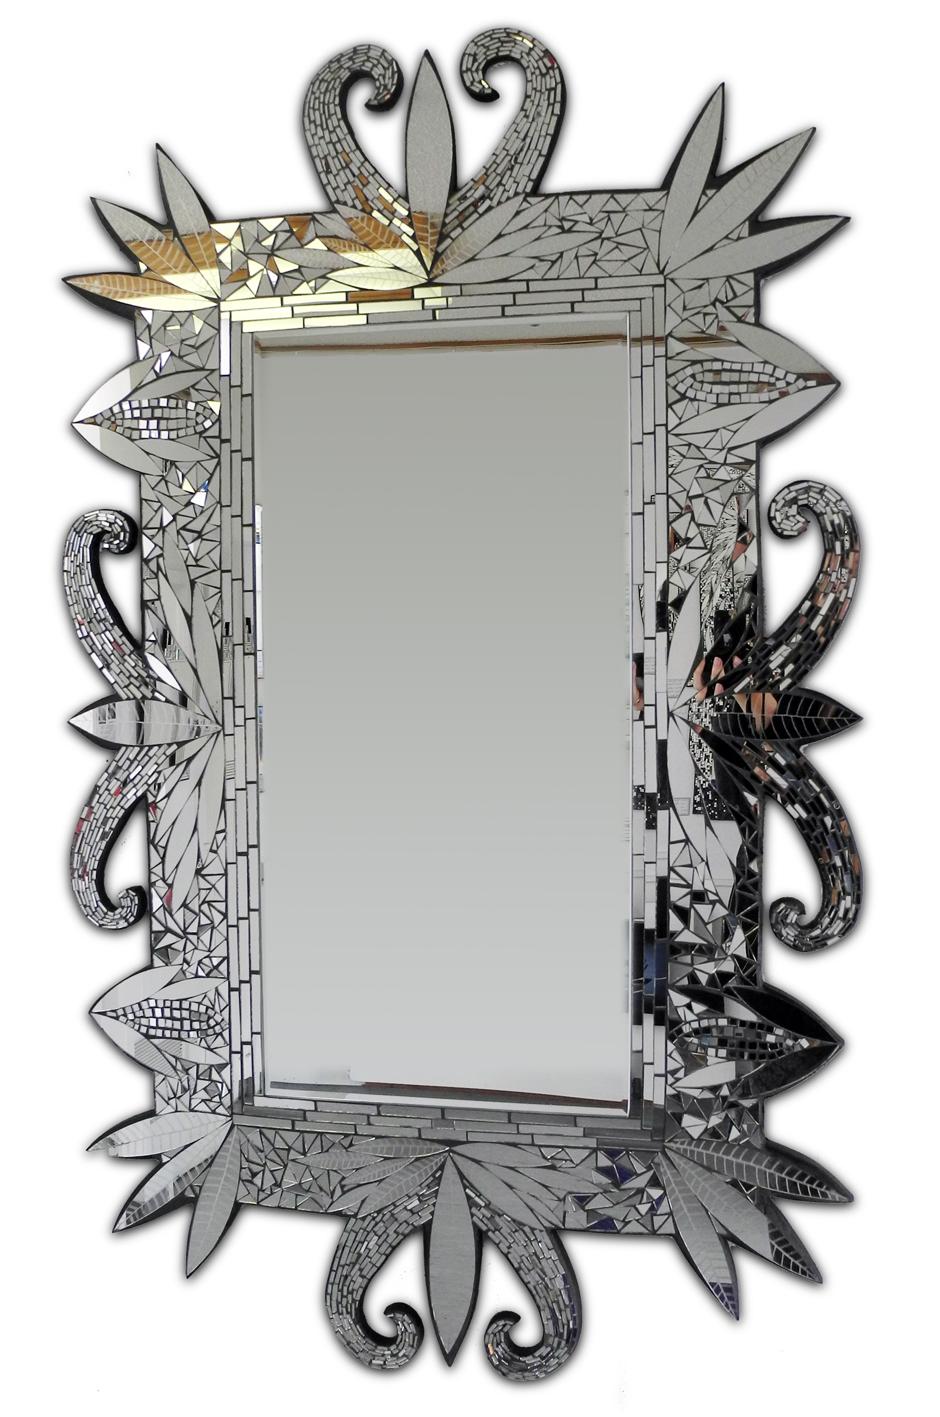 Exotic Garden - Mosaic Mirror - 700 X 1600mm - Jane Brimblecombe - $1150